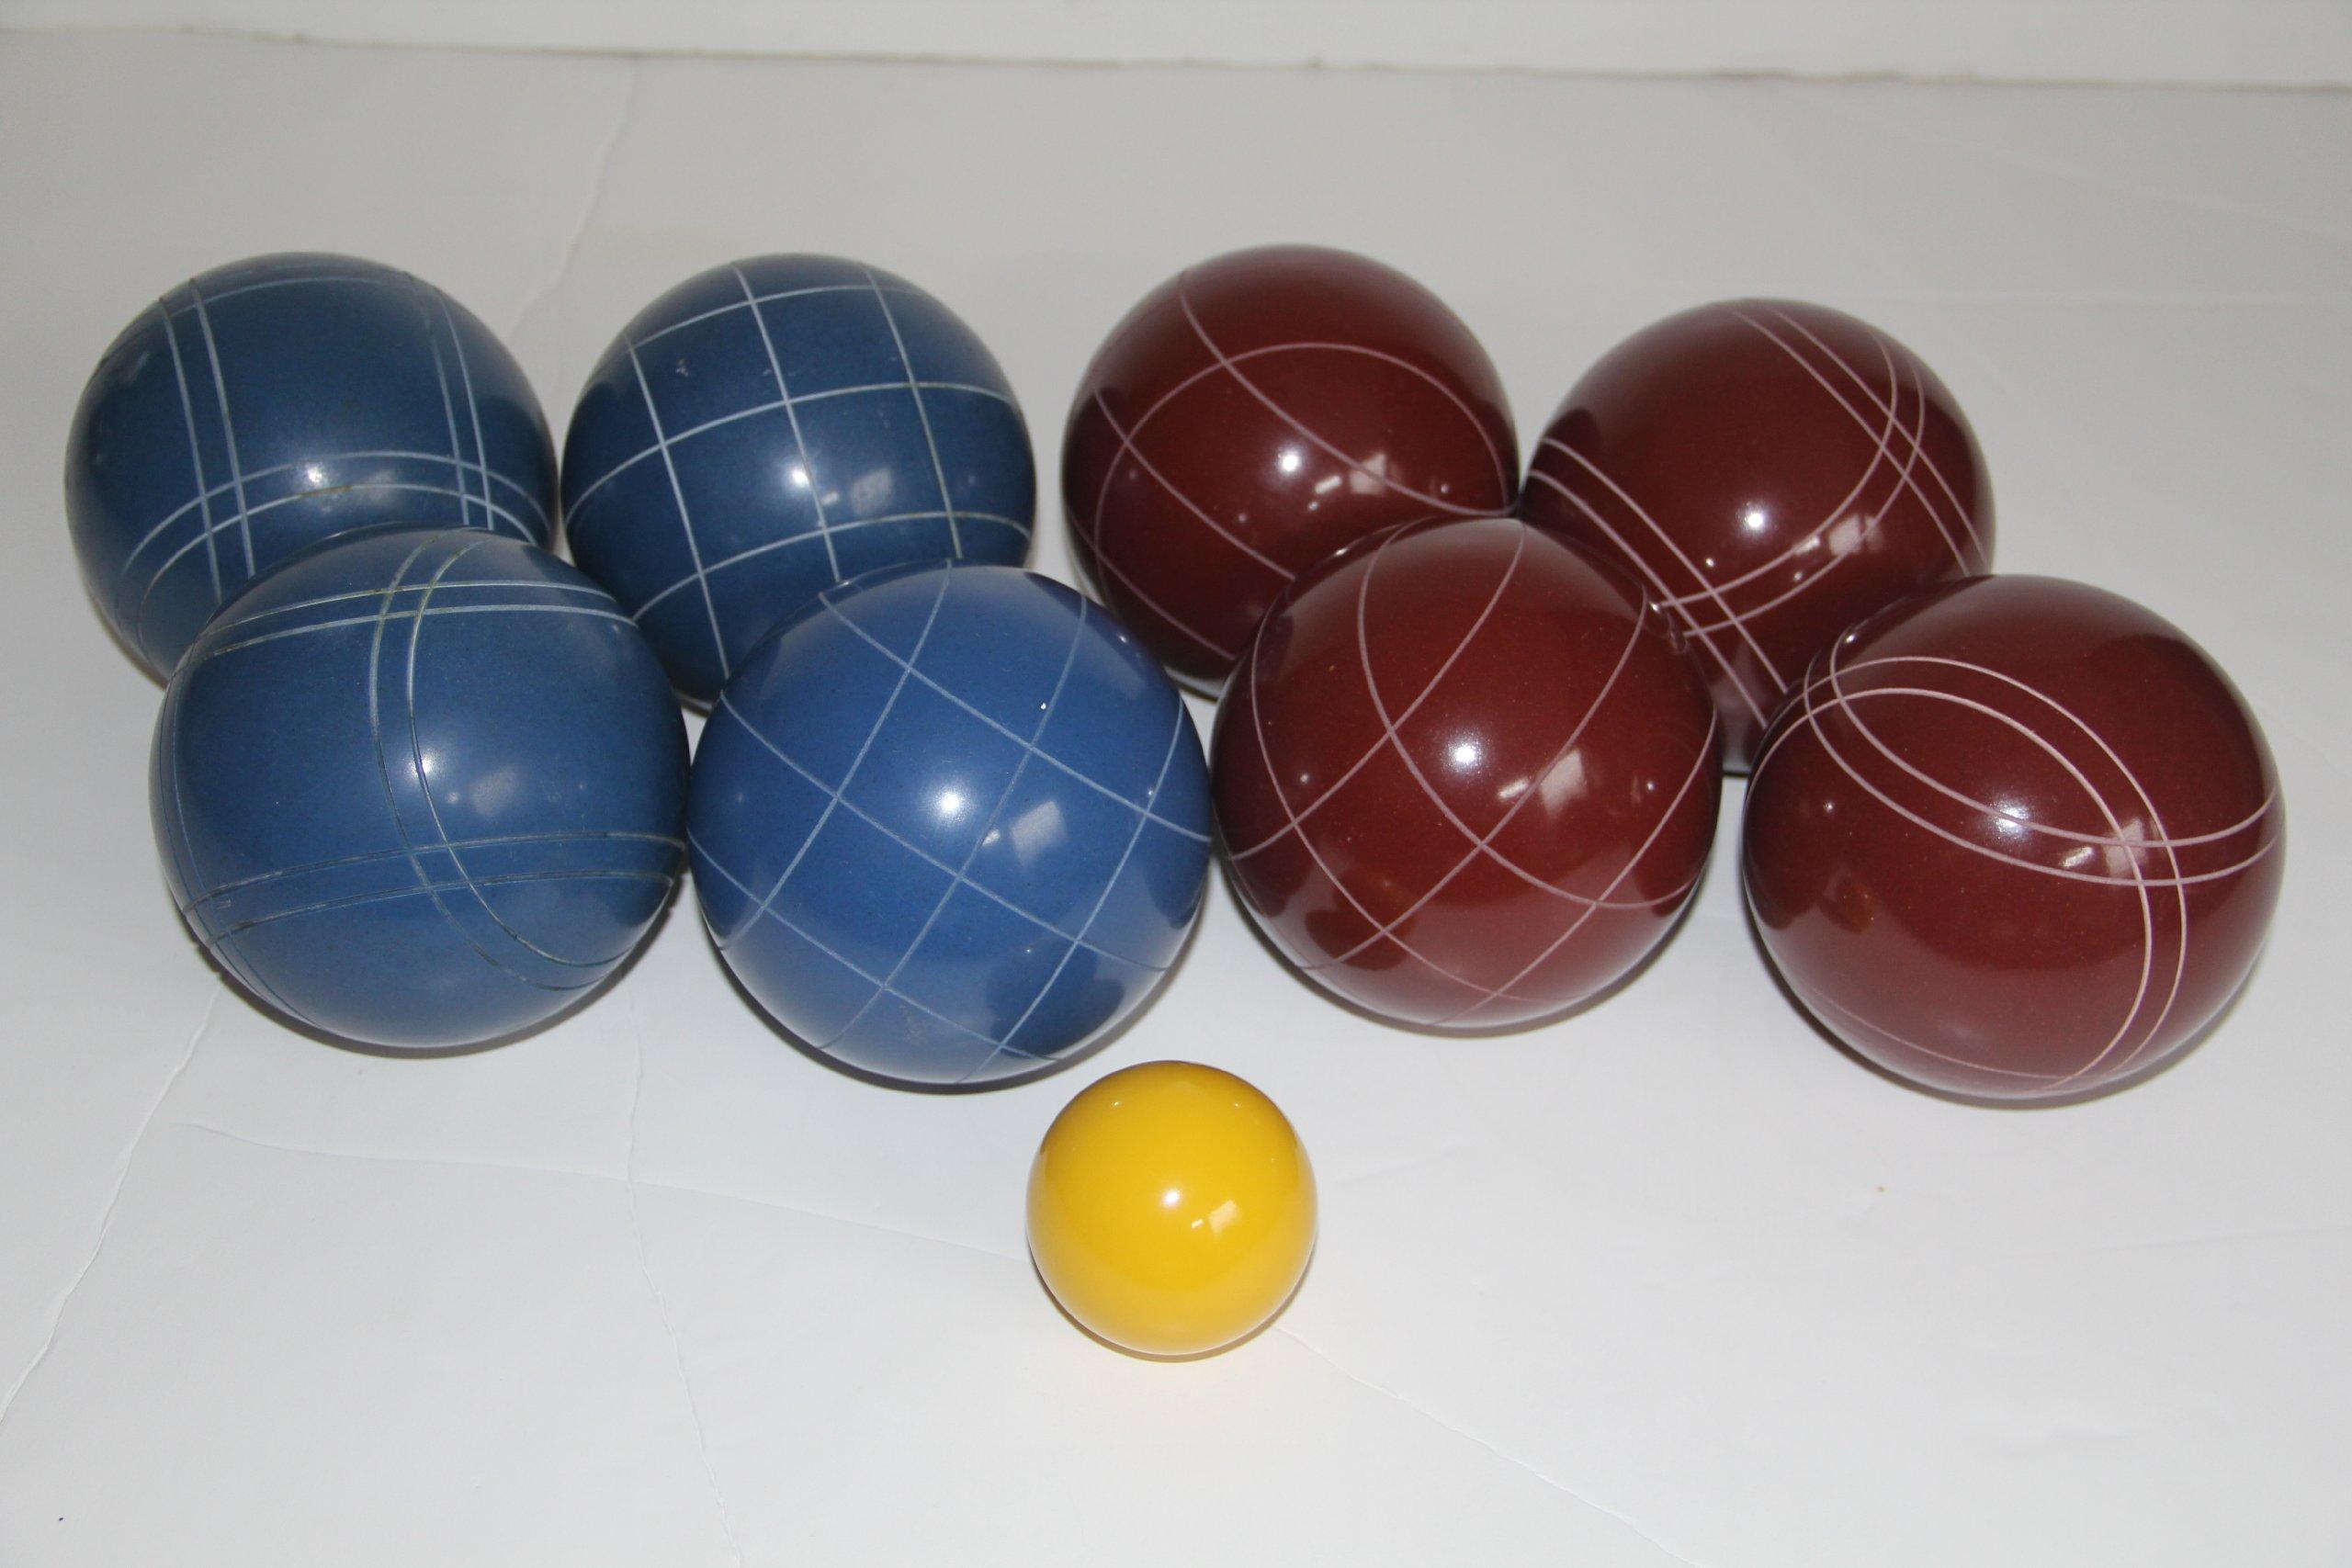 Premium Quality Epco Tournament Set - 110mm Red and Blue Bocce Balls - No BAG Option [Toy]